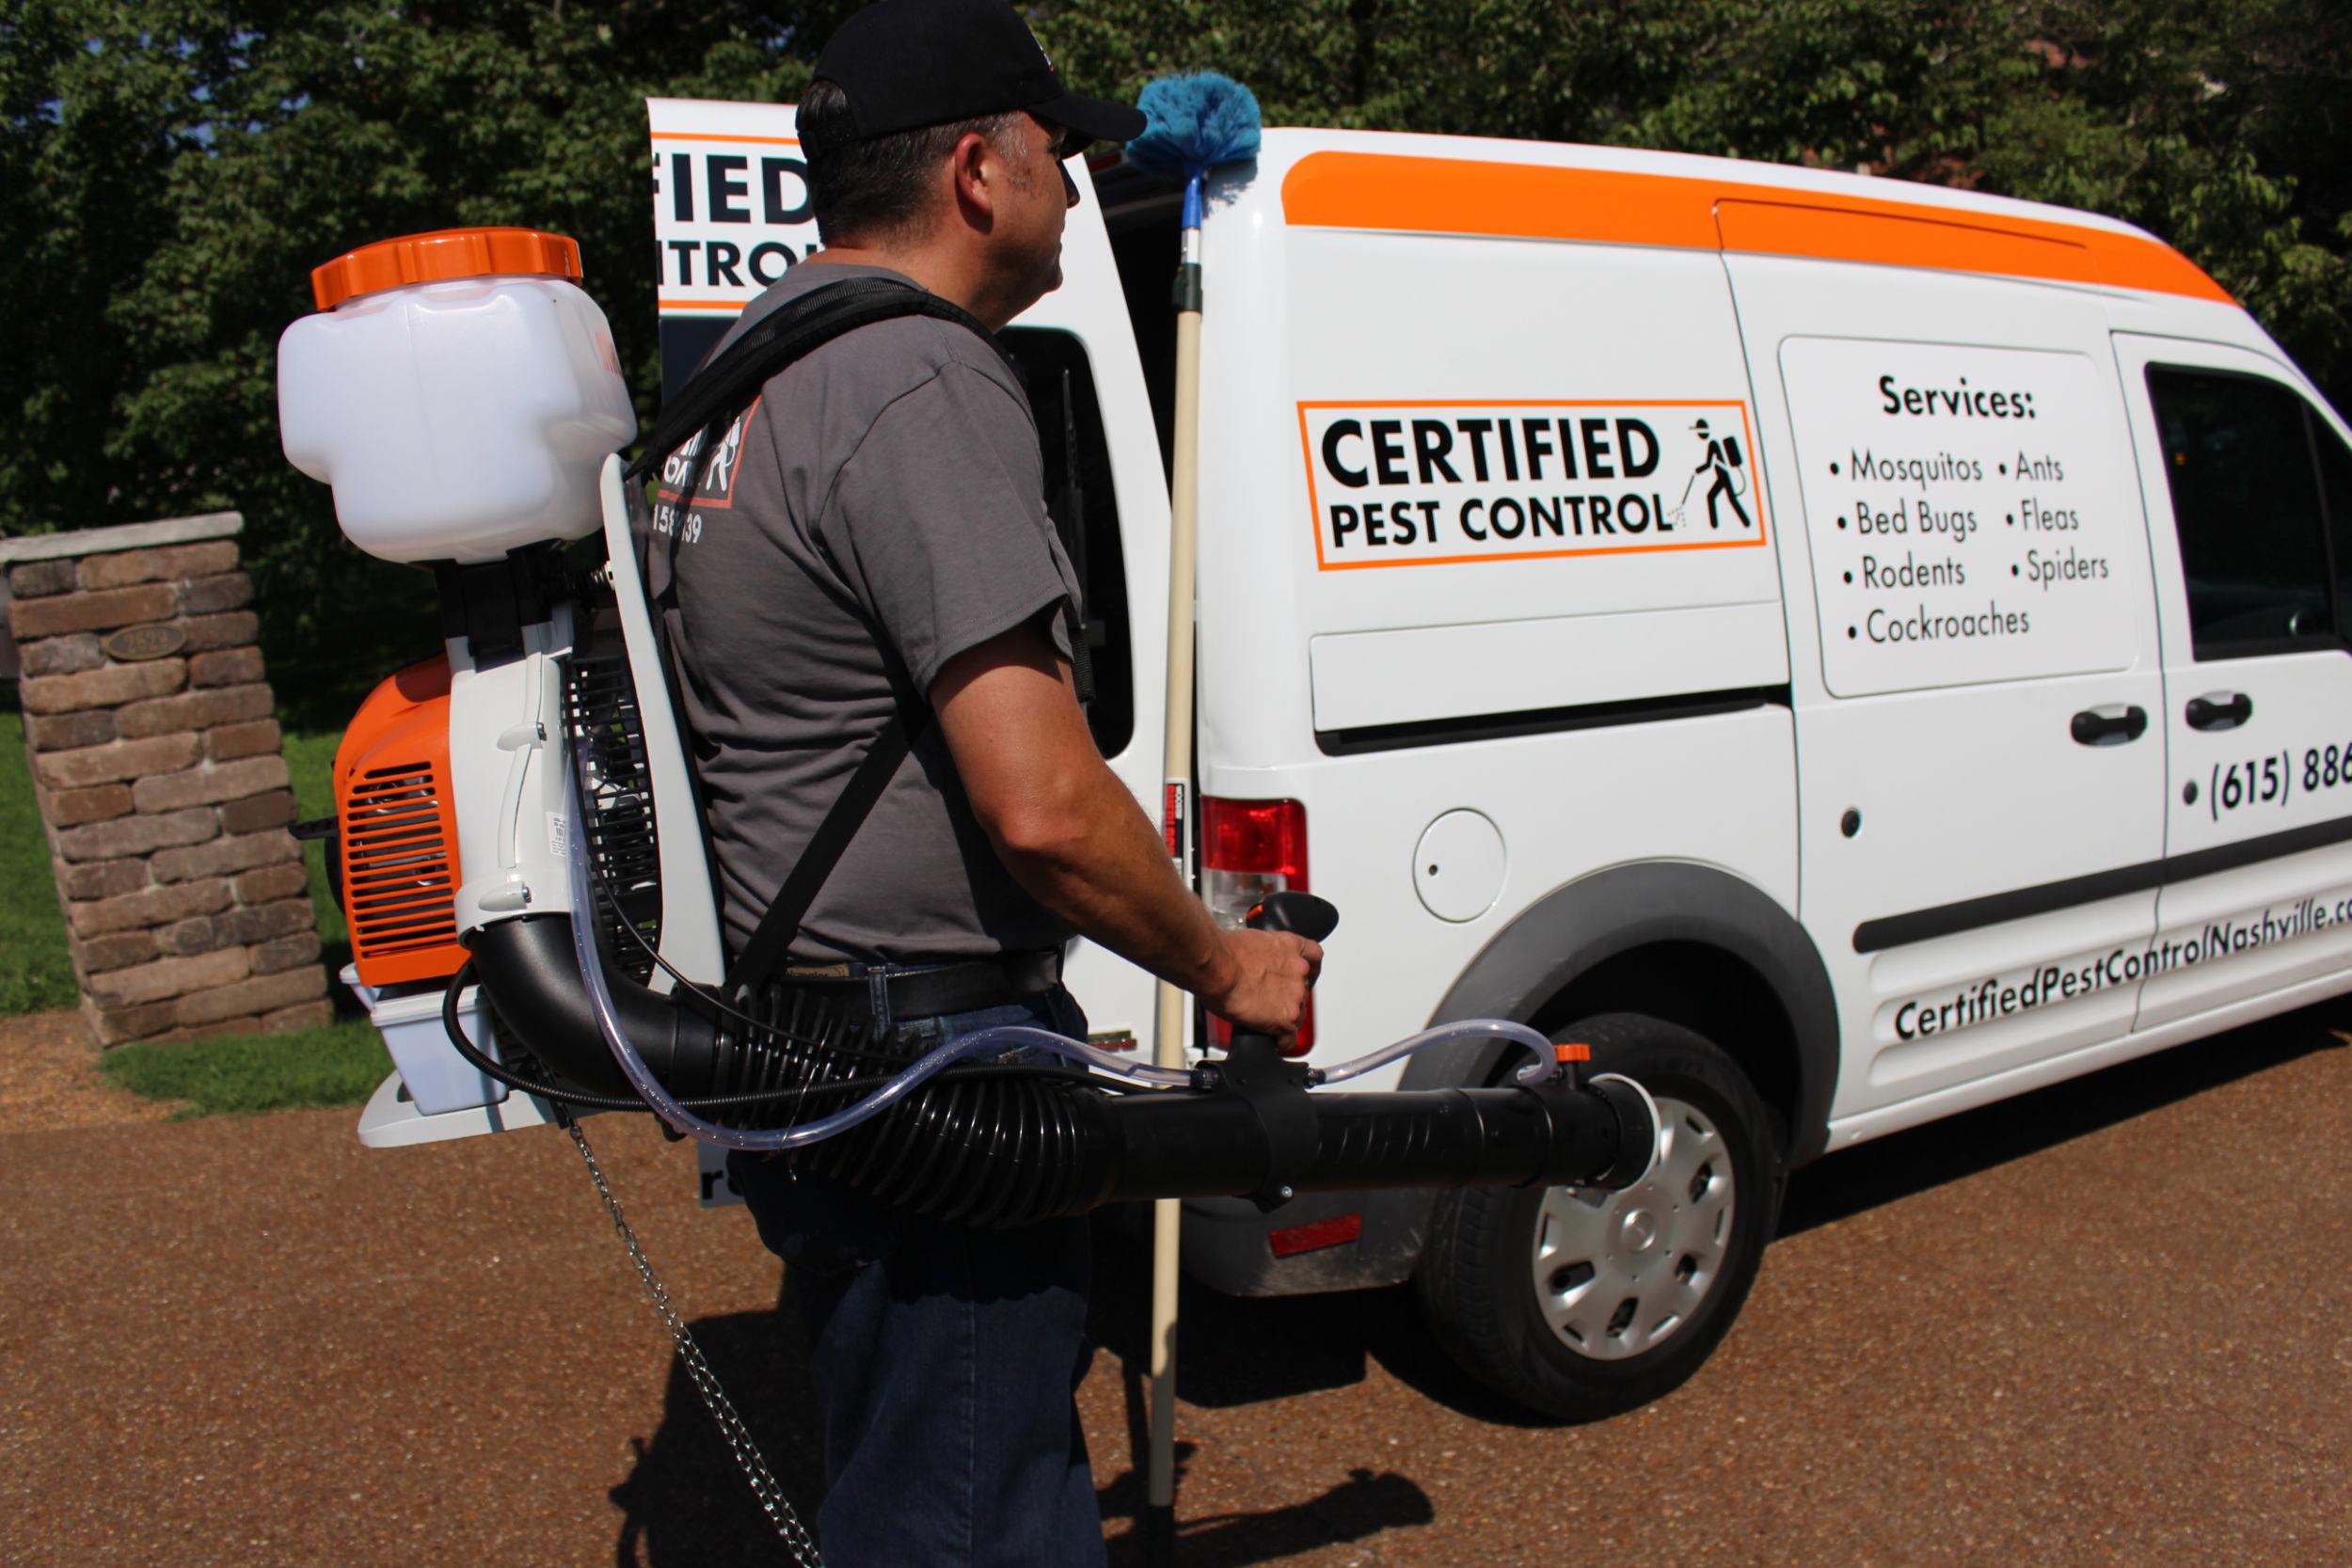 Pest Control Van